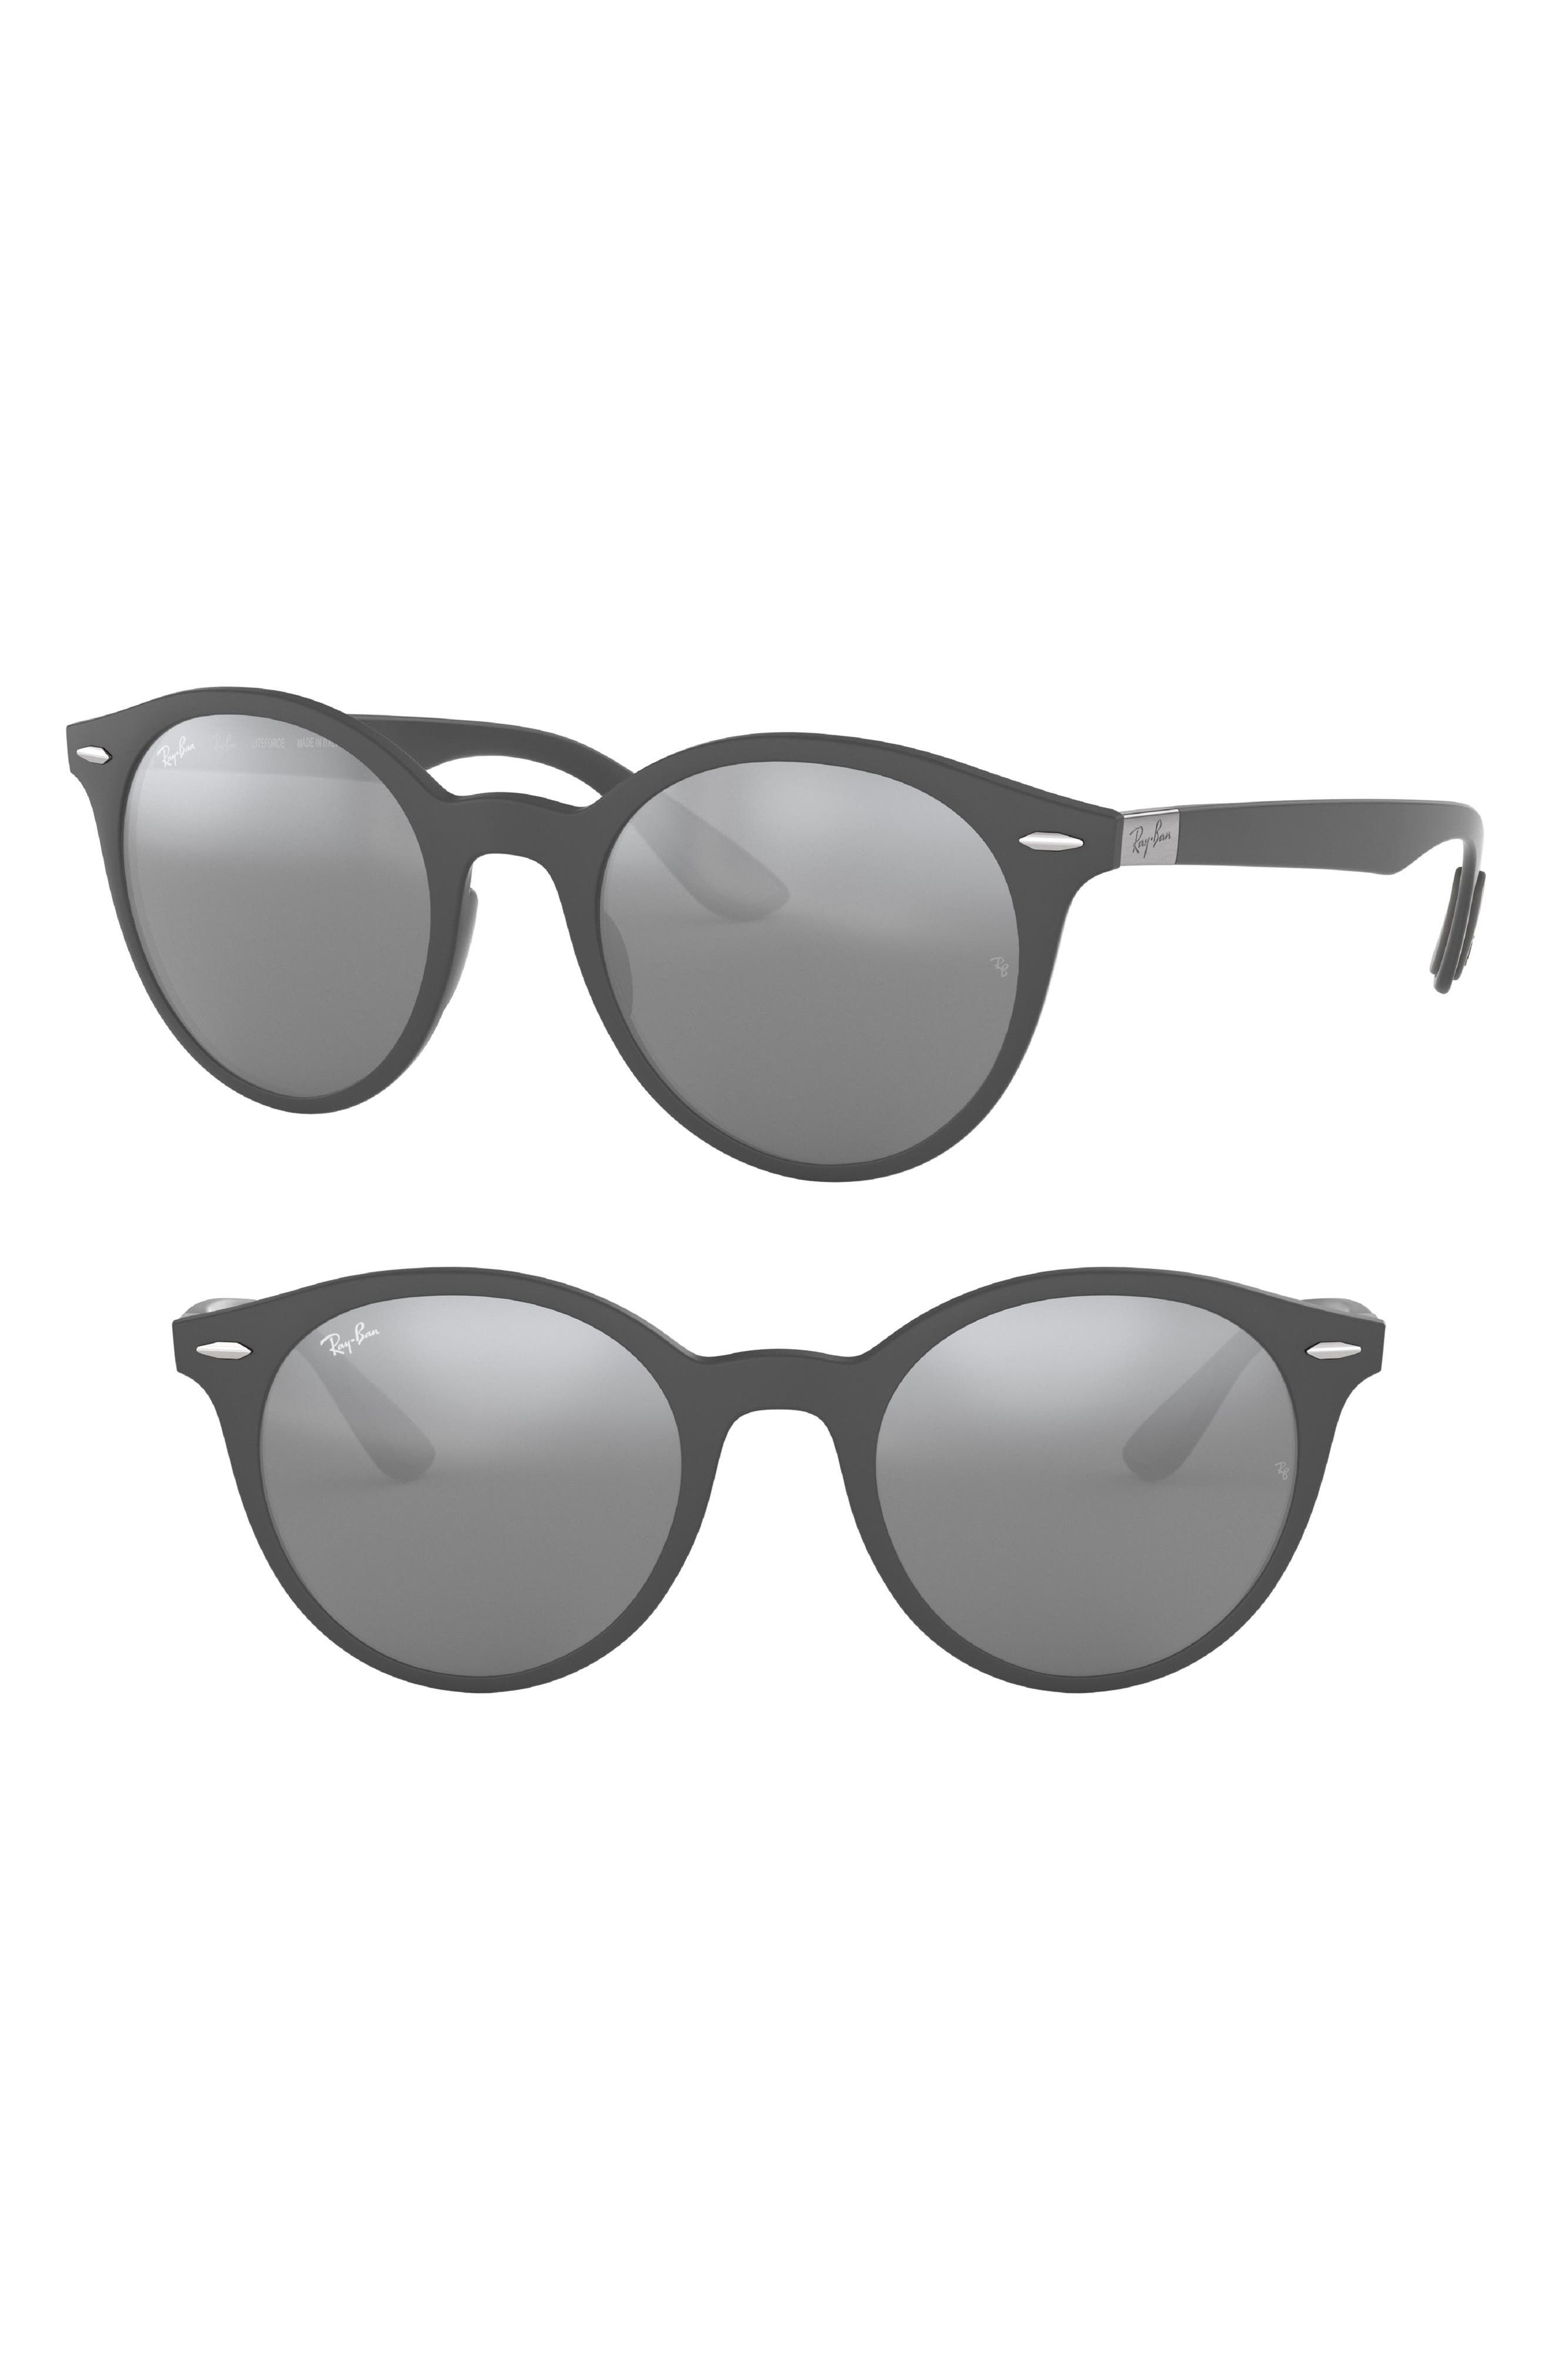 Phantos 50mm Mirrored Sunglasses,                         Main,                         color, Dark Grey